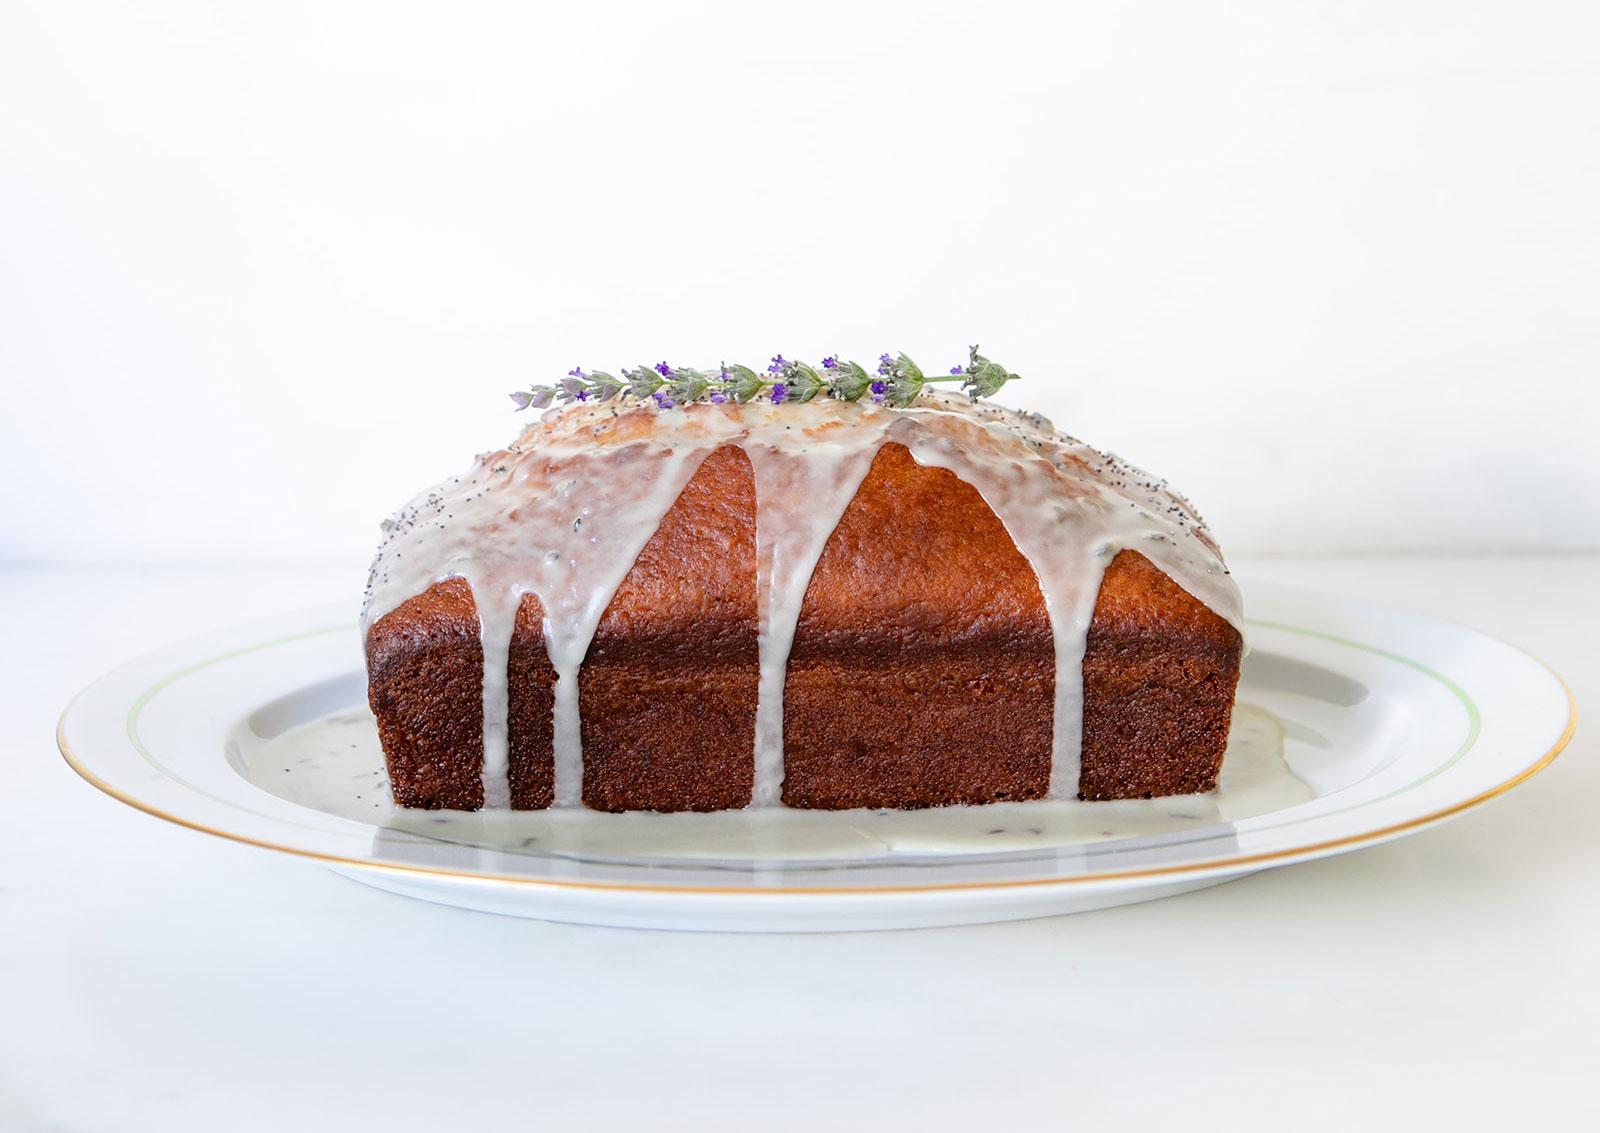 leanne citrone lavender cake 3